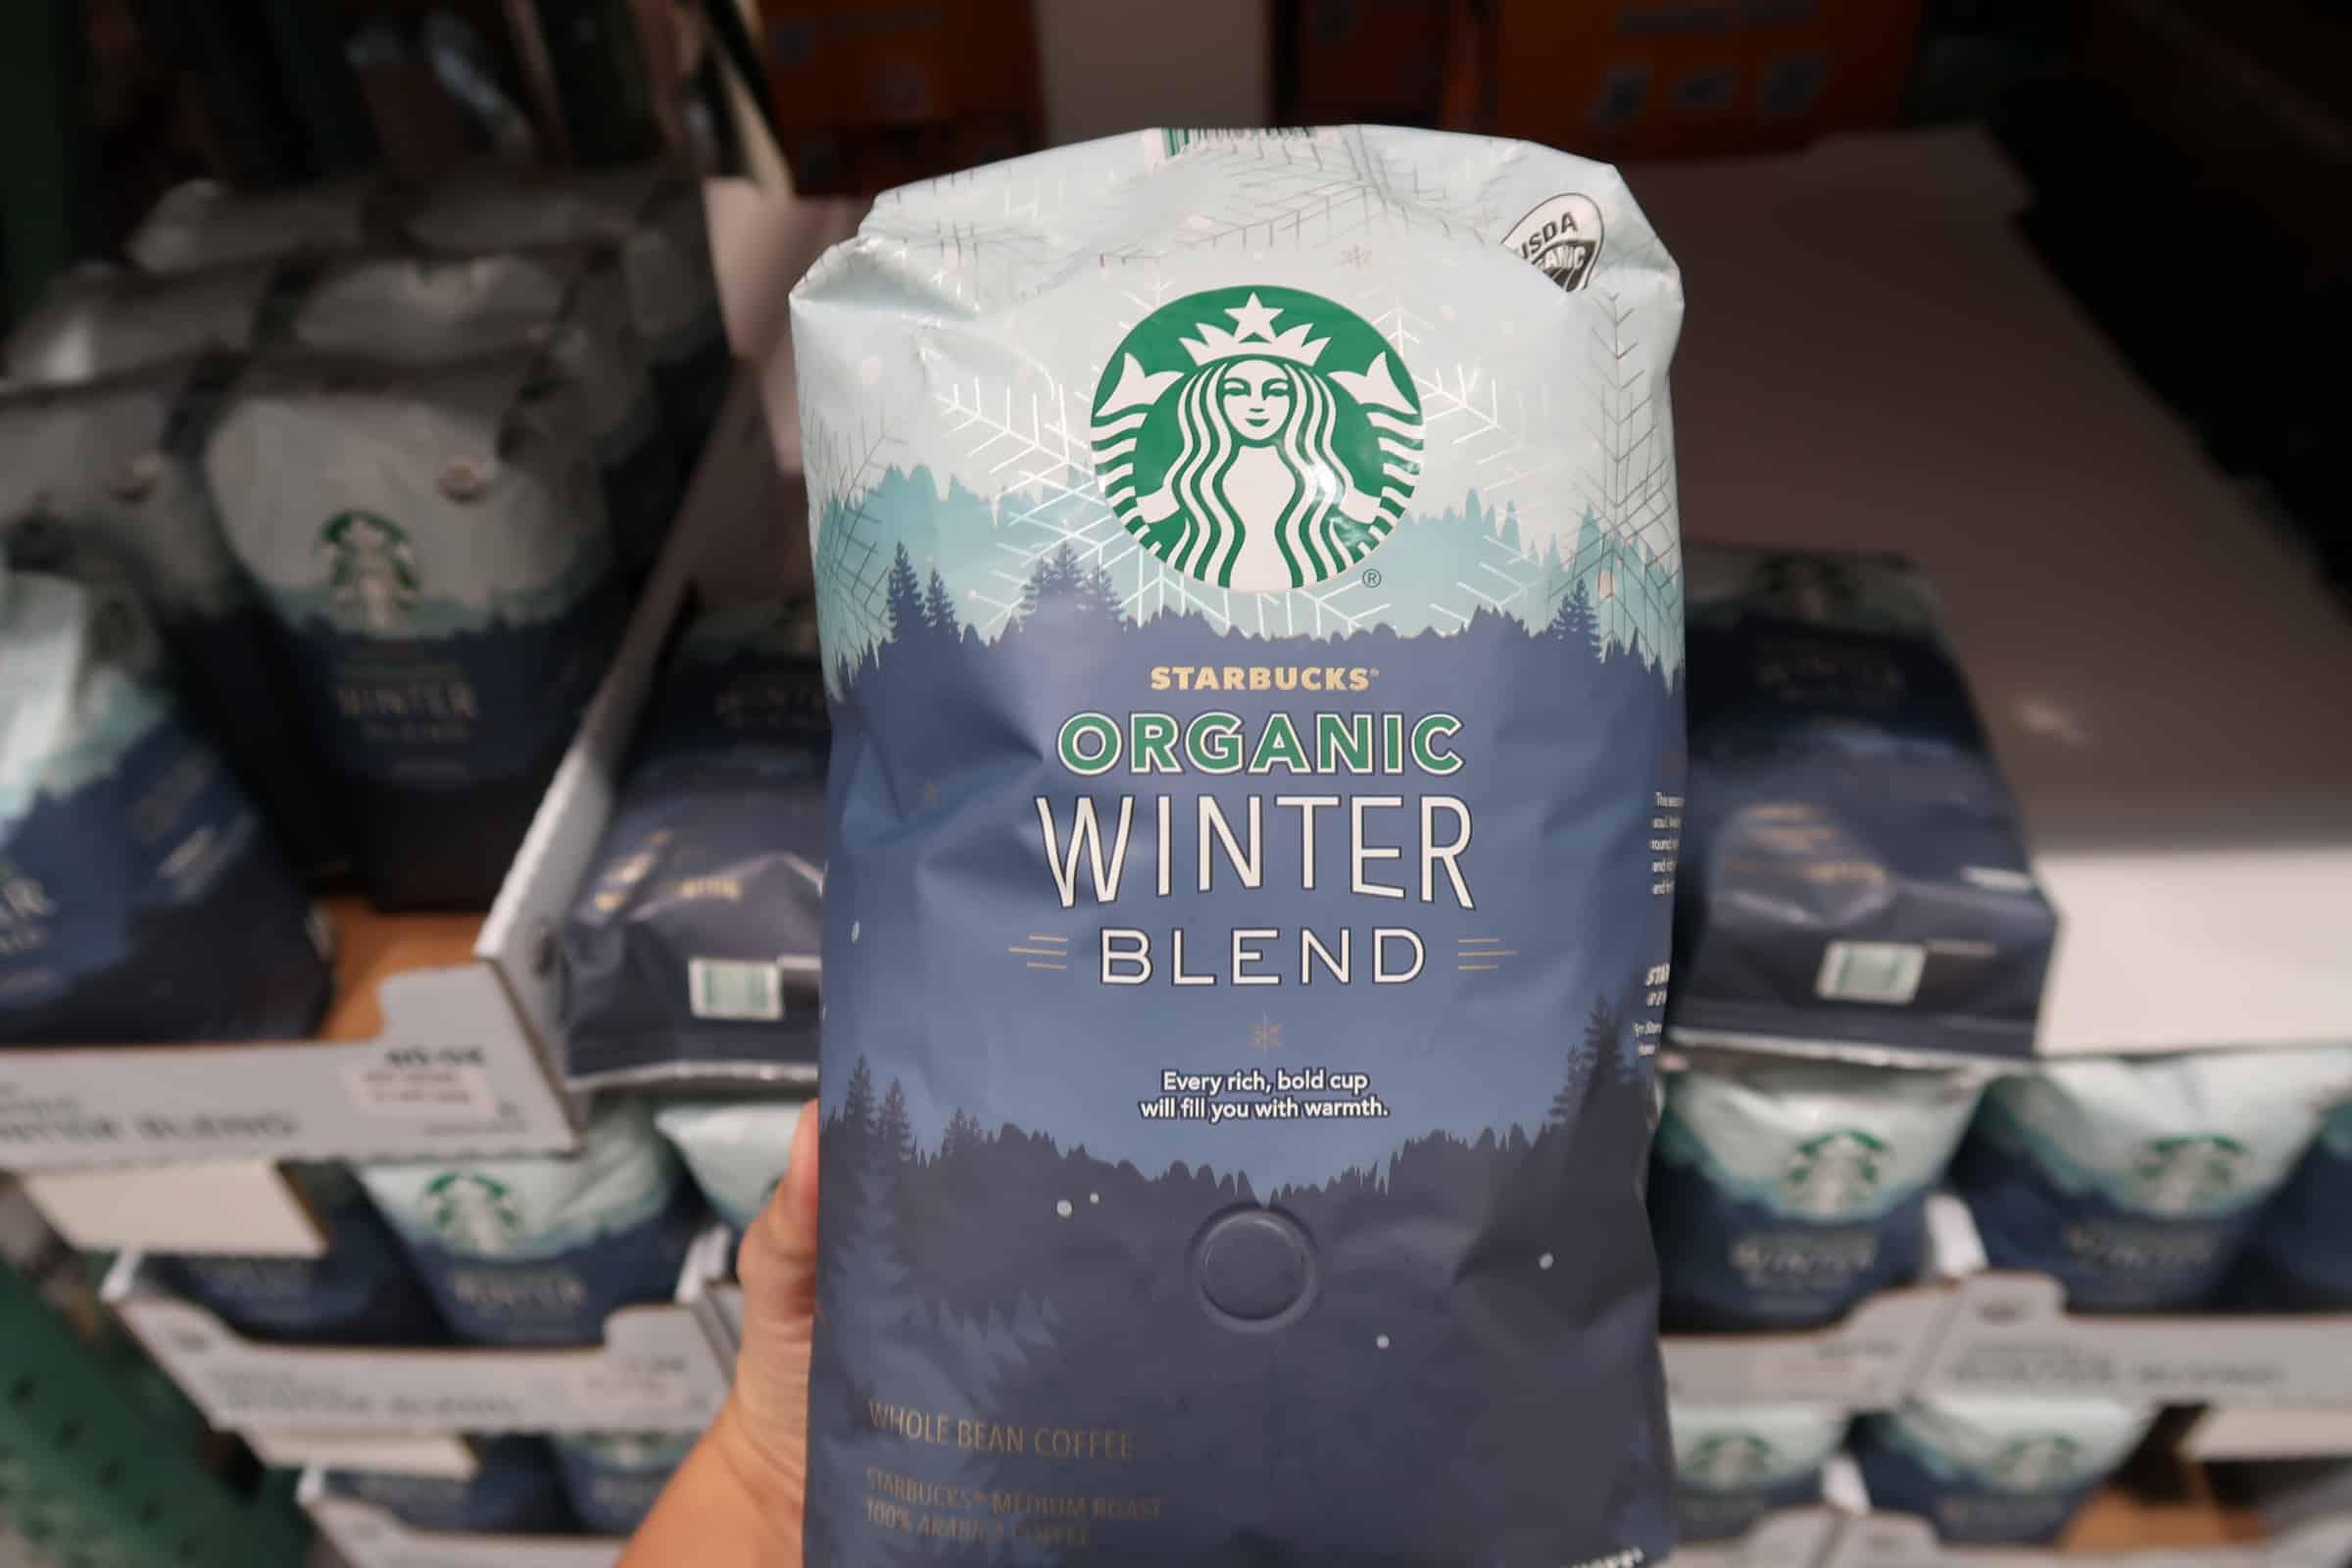 Starbucks Organic Winter Blend at Costco